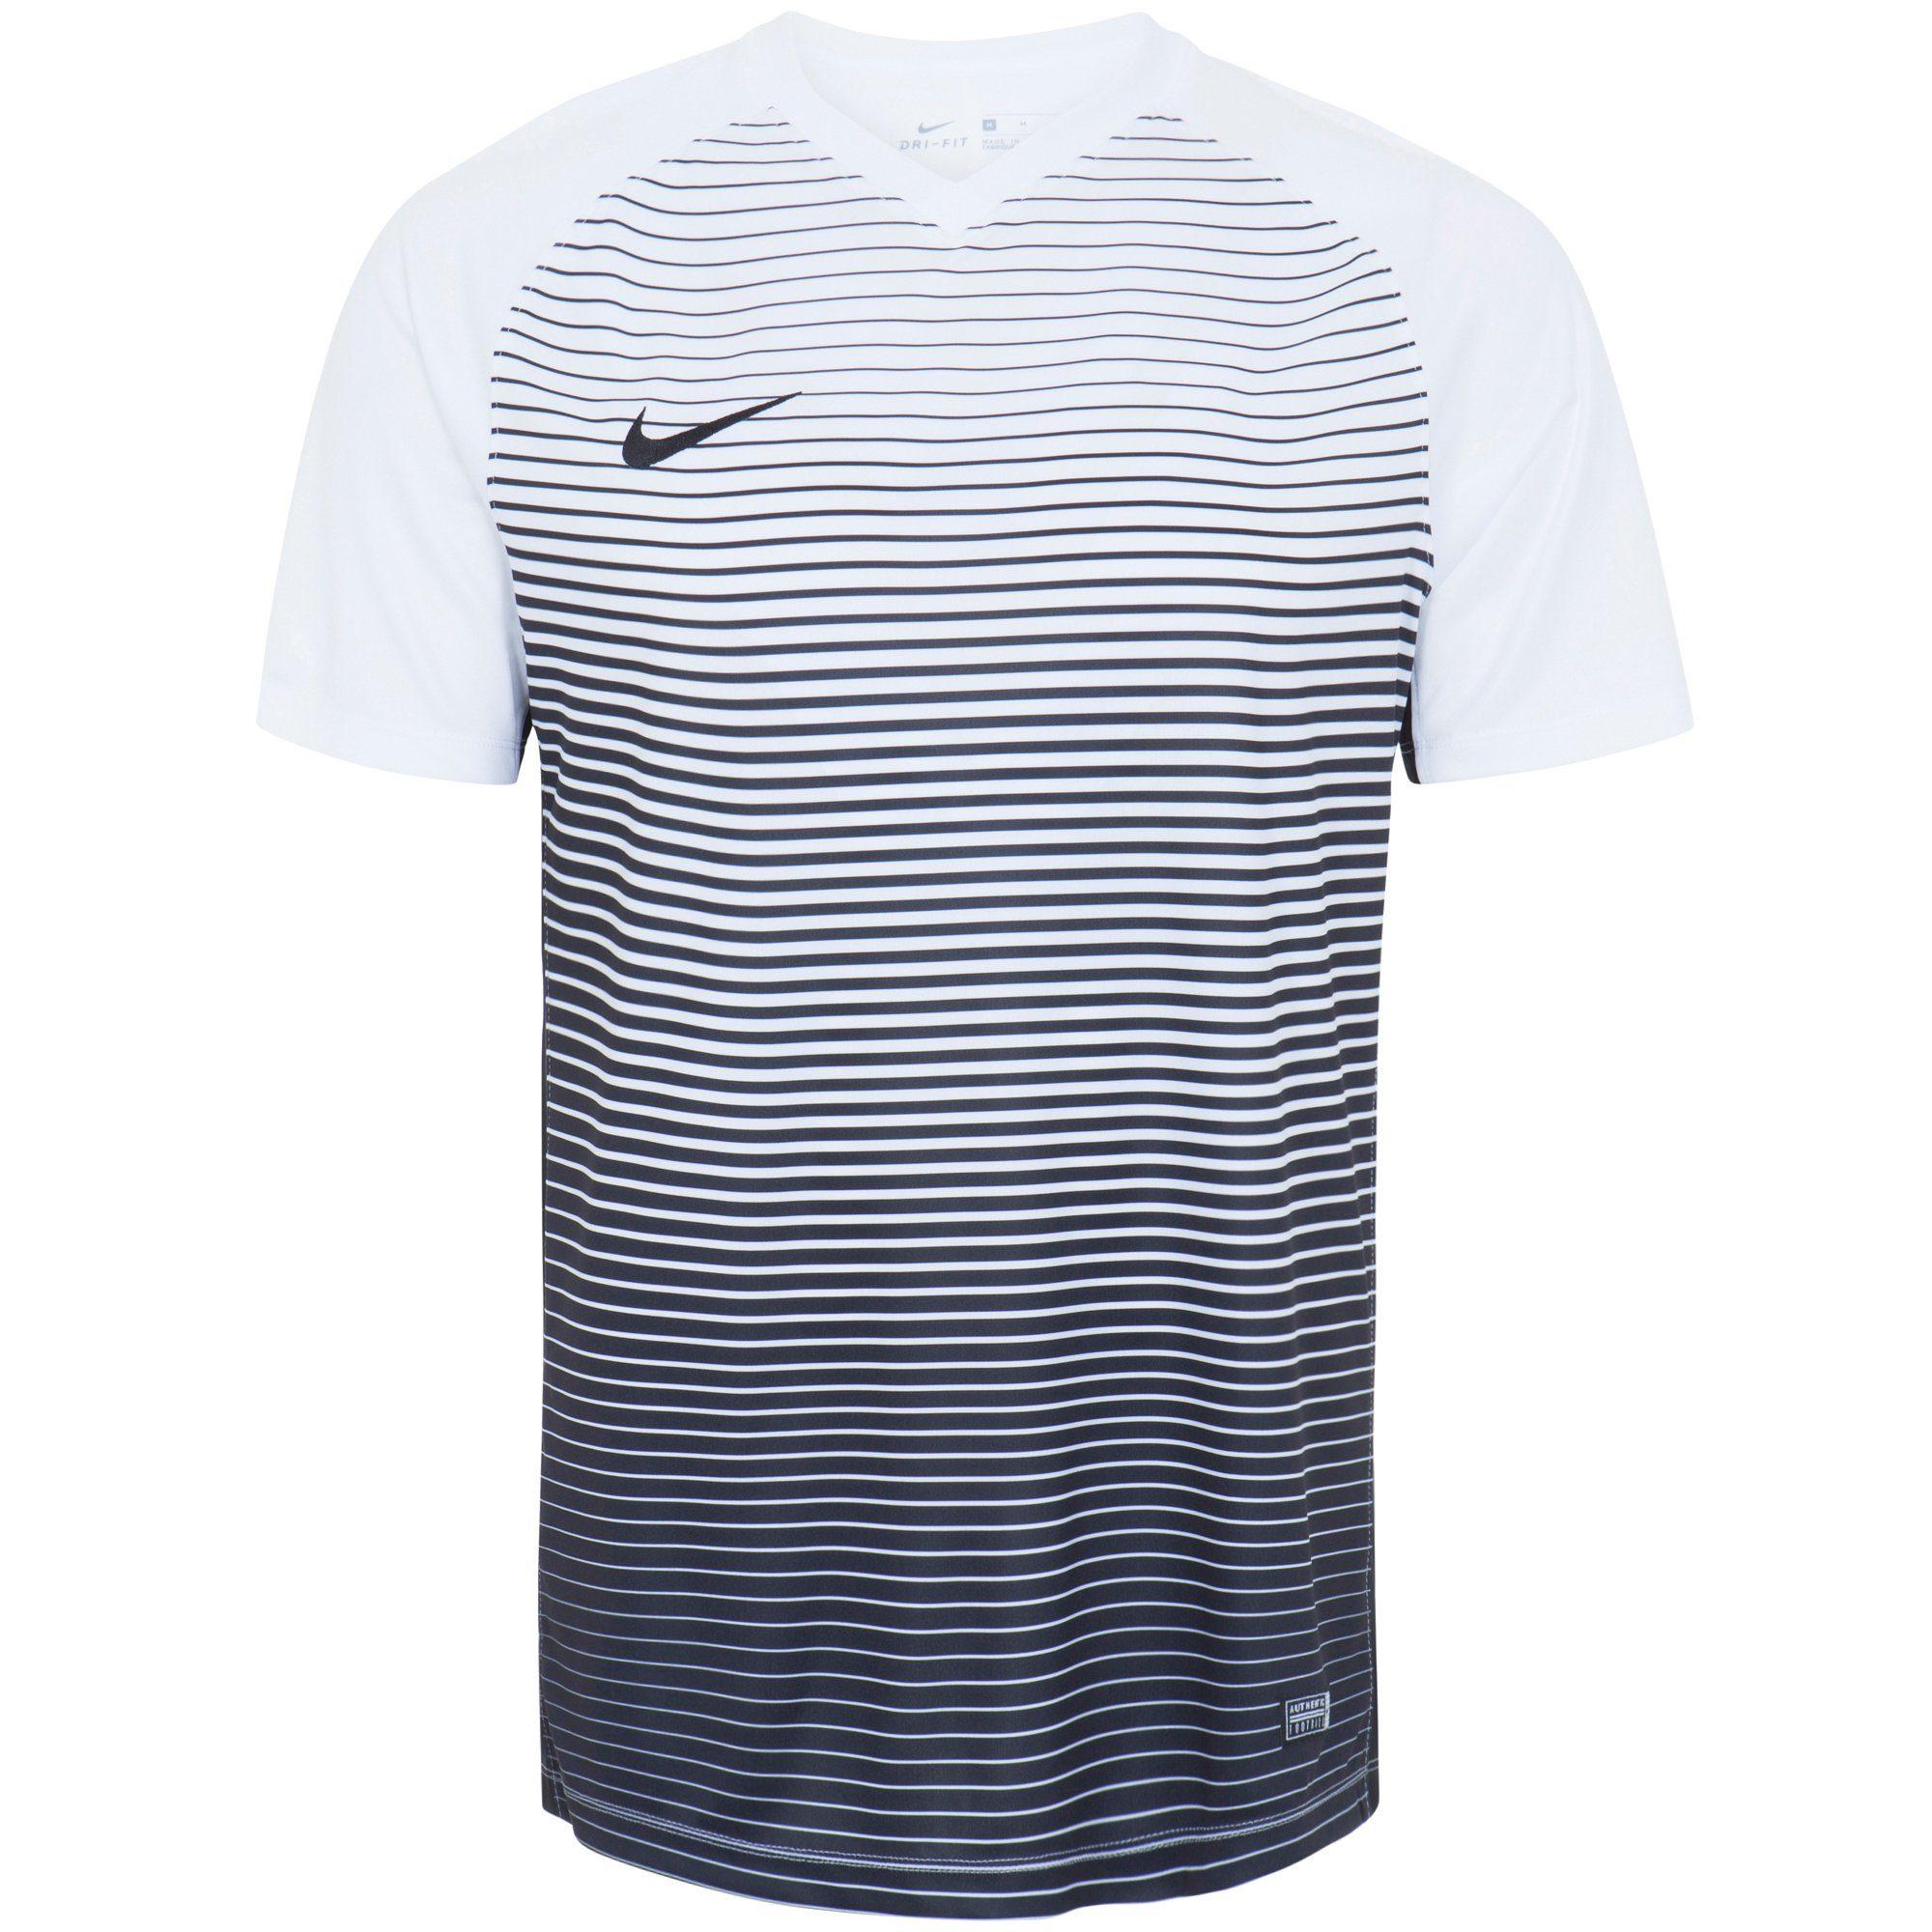 Nike Fußballtrikot »Precision Iv« | Sportbekleidung > Trikots | Weiß | Ab - Trikot | NIKE